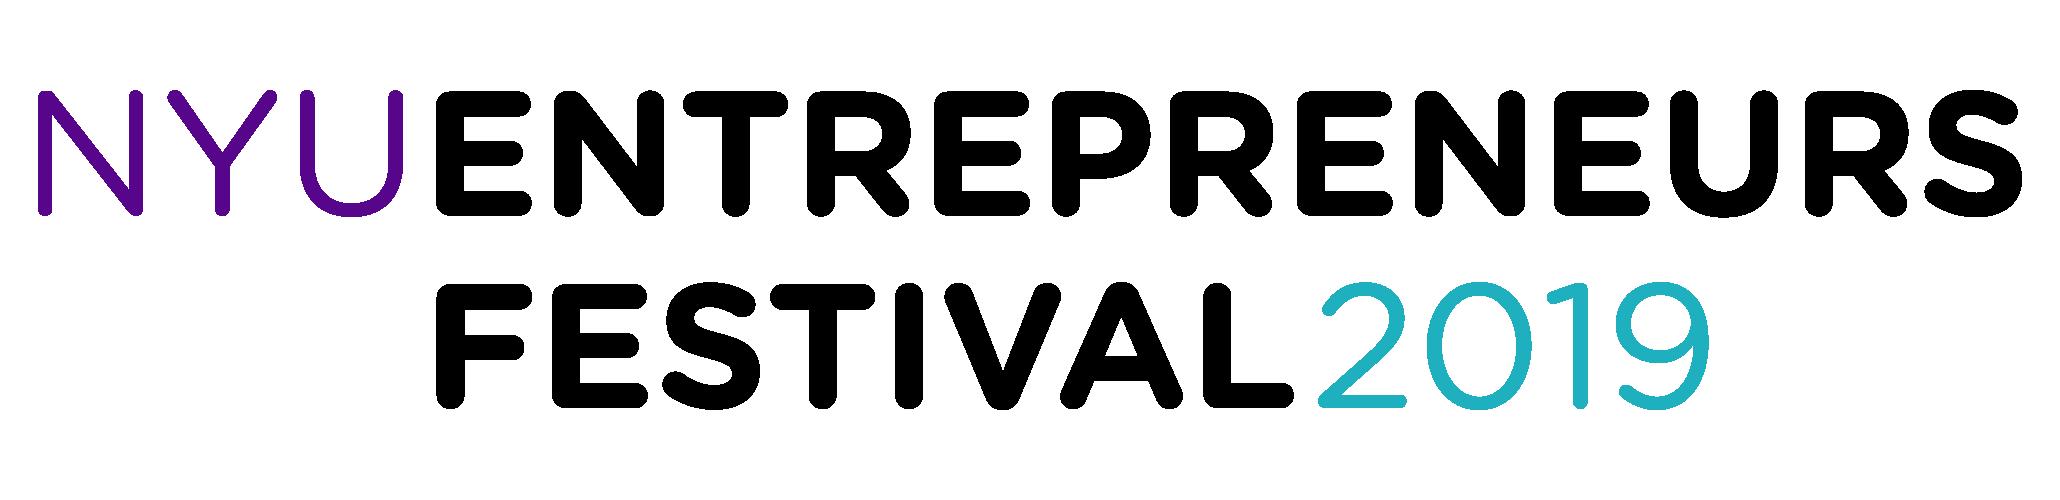 NYU Entrepreneurs Festival Logo